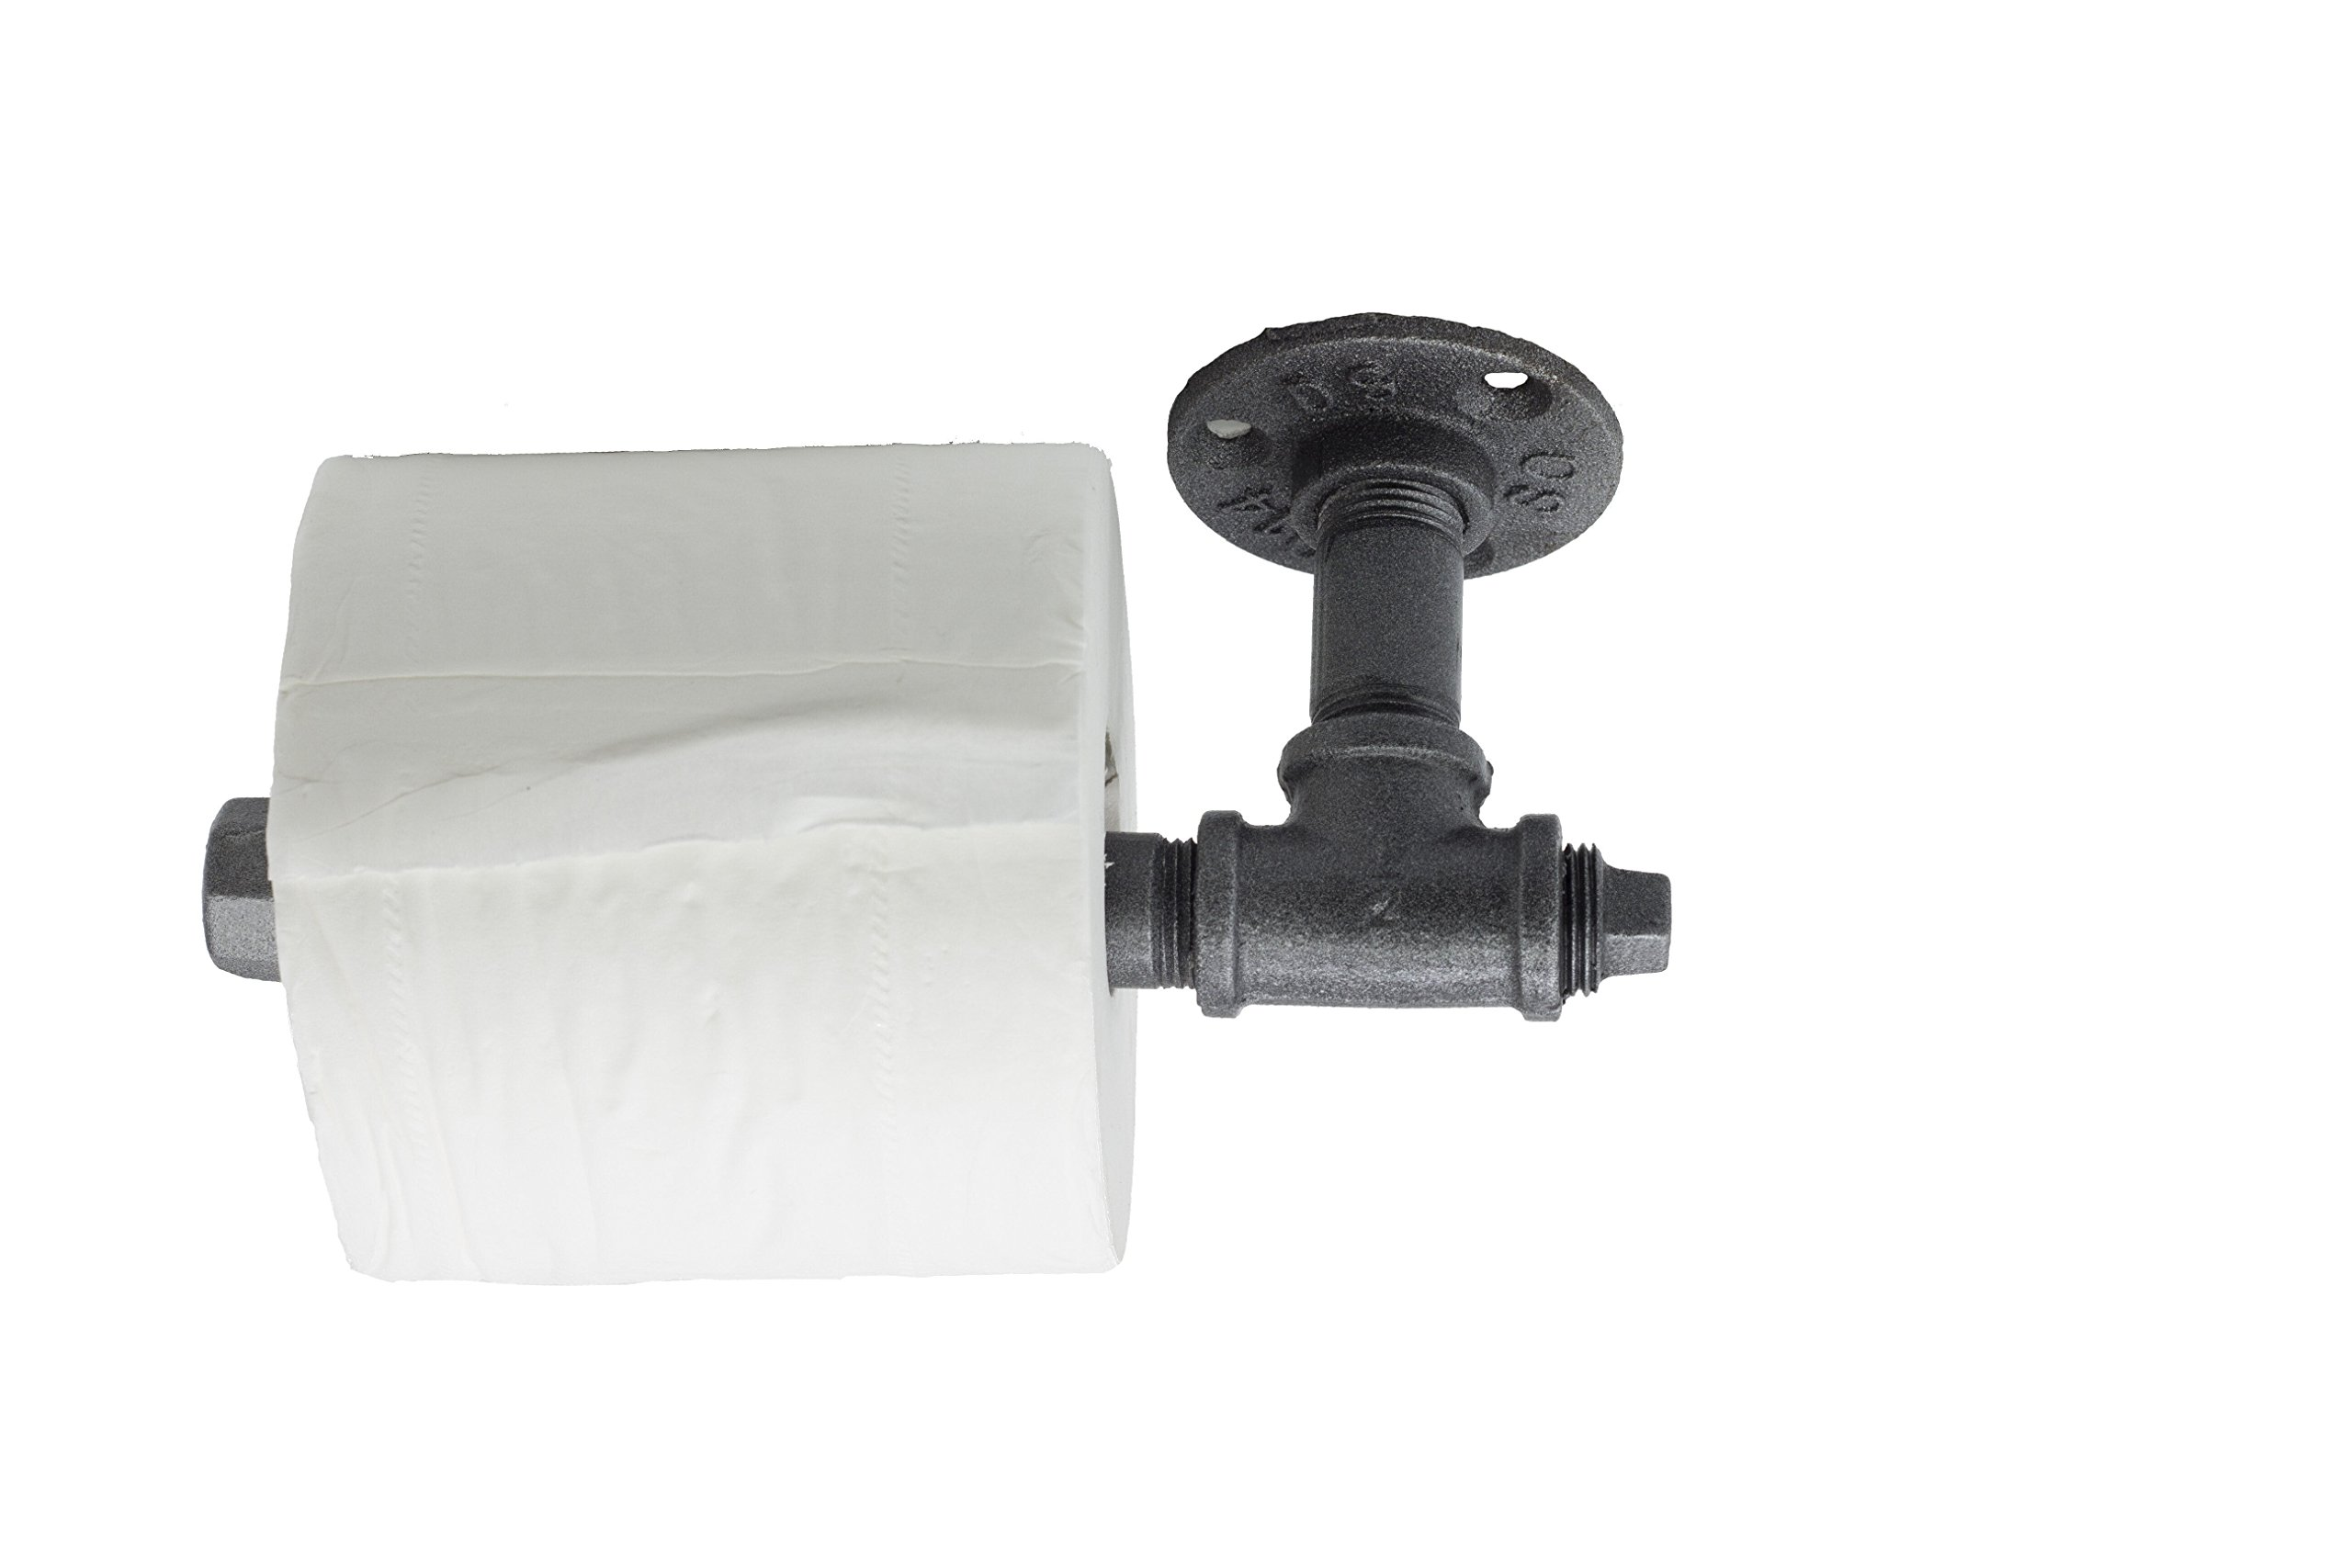 Y-Nut Industrial Vintage Toilet Paper Holder, Leon, Steampunk Toilet Paper Dispenser TPD-001 3